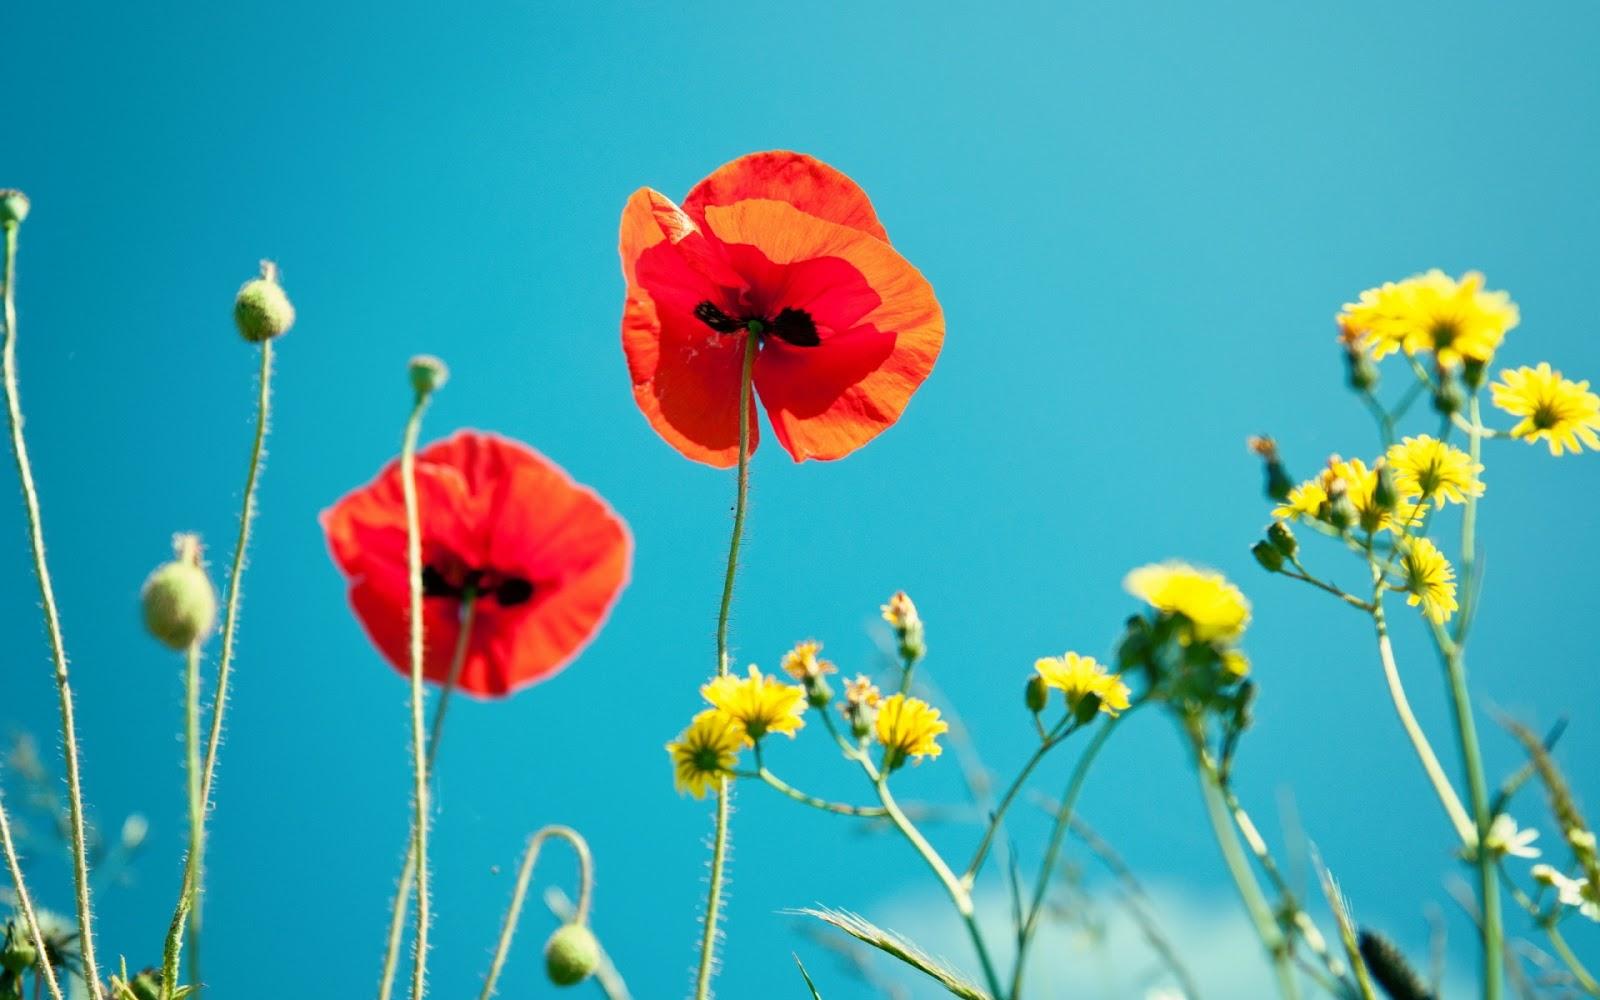 Les plus beau fond ecran fleurs fond ecran pc for Les plus beau fond ecran